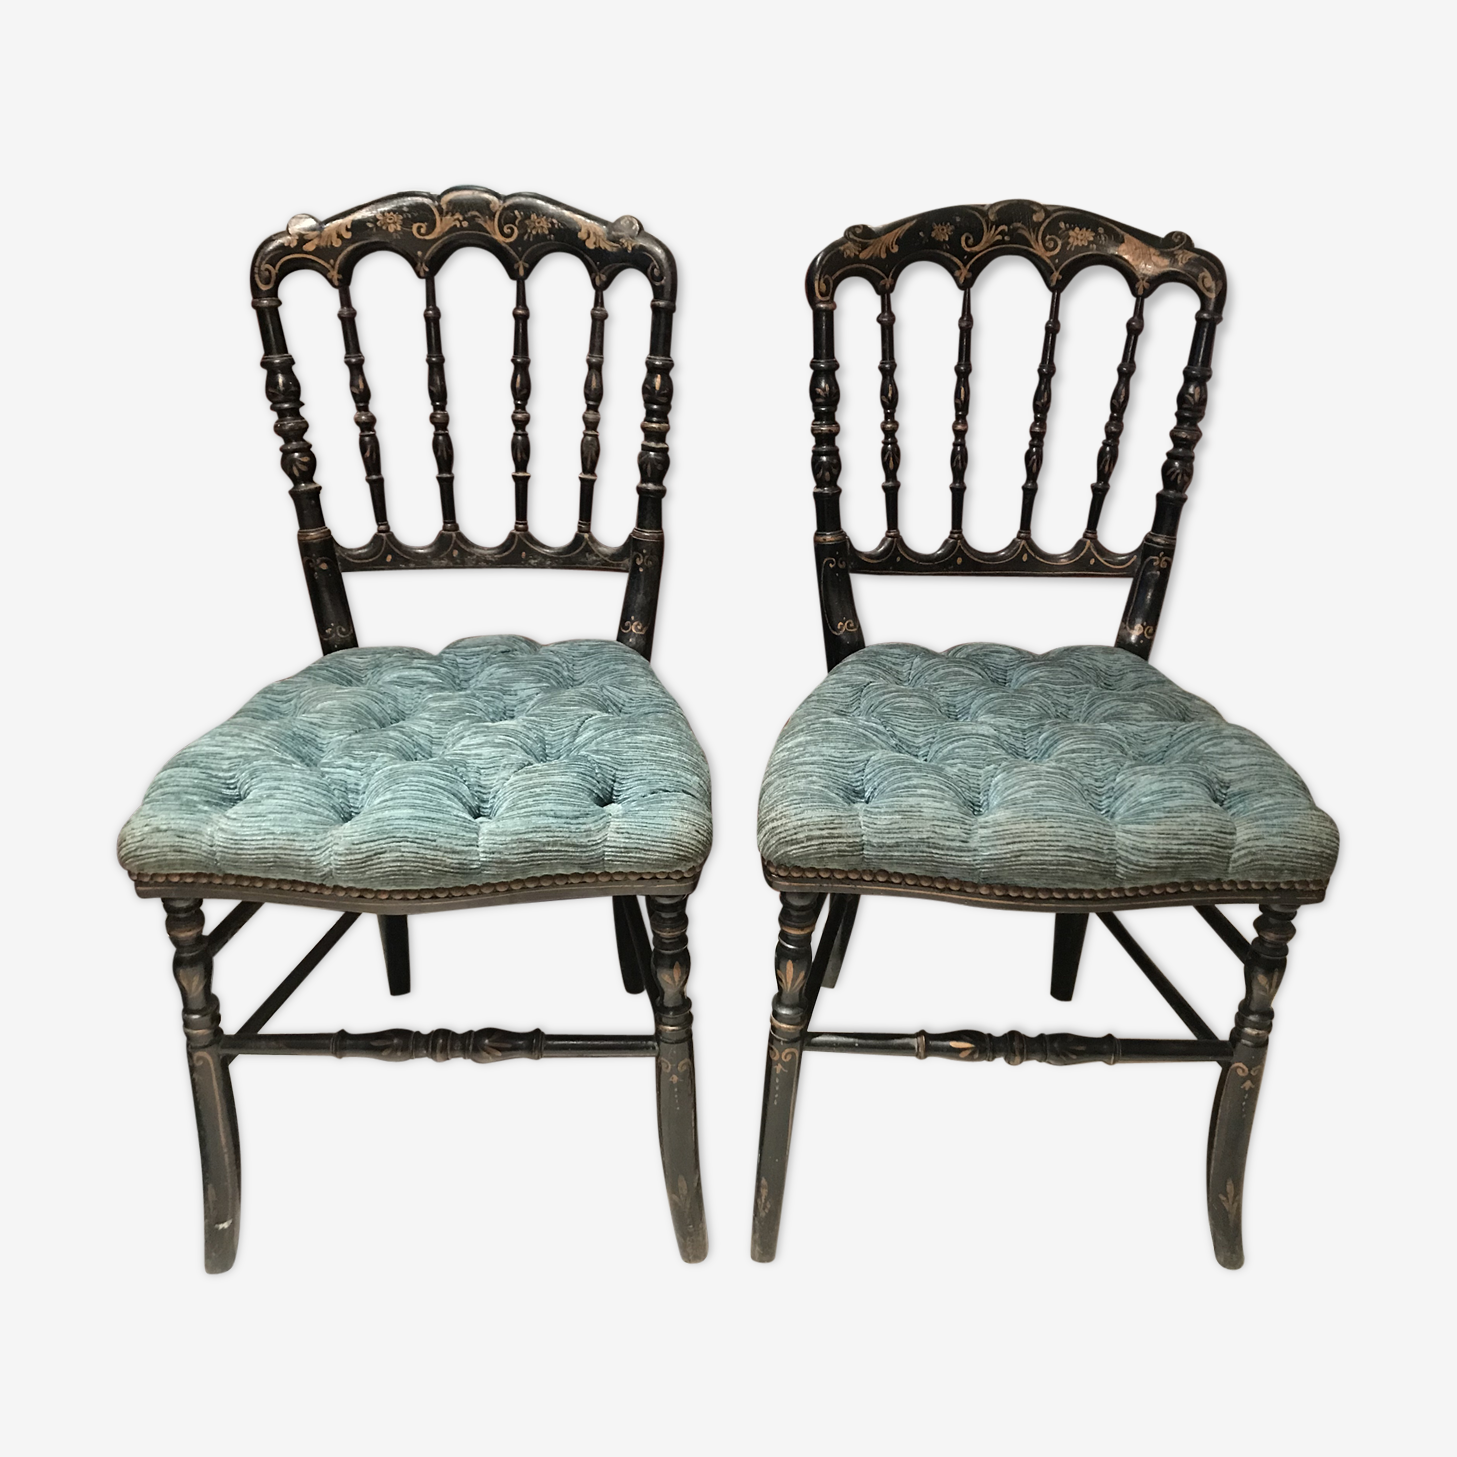 Pair of Napoleon III chairs